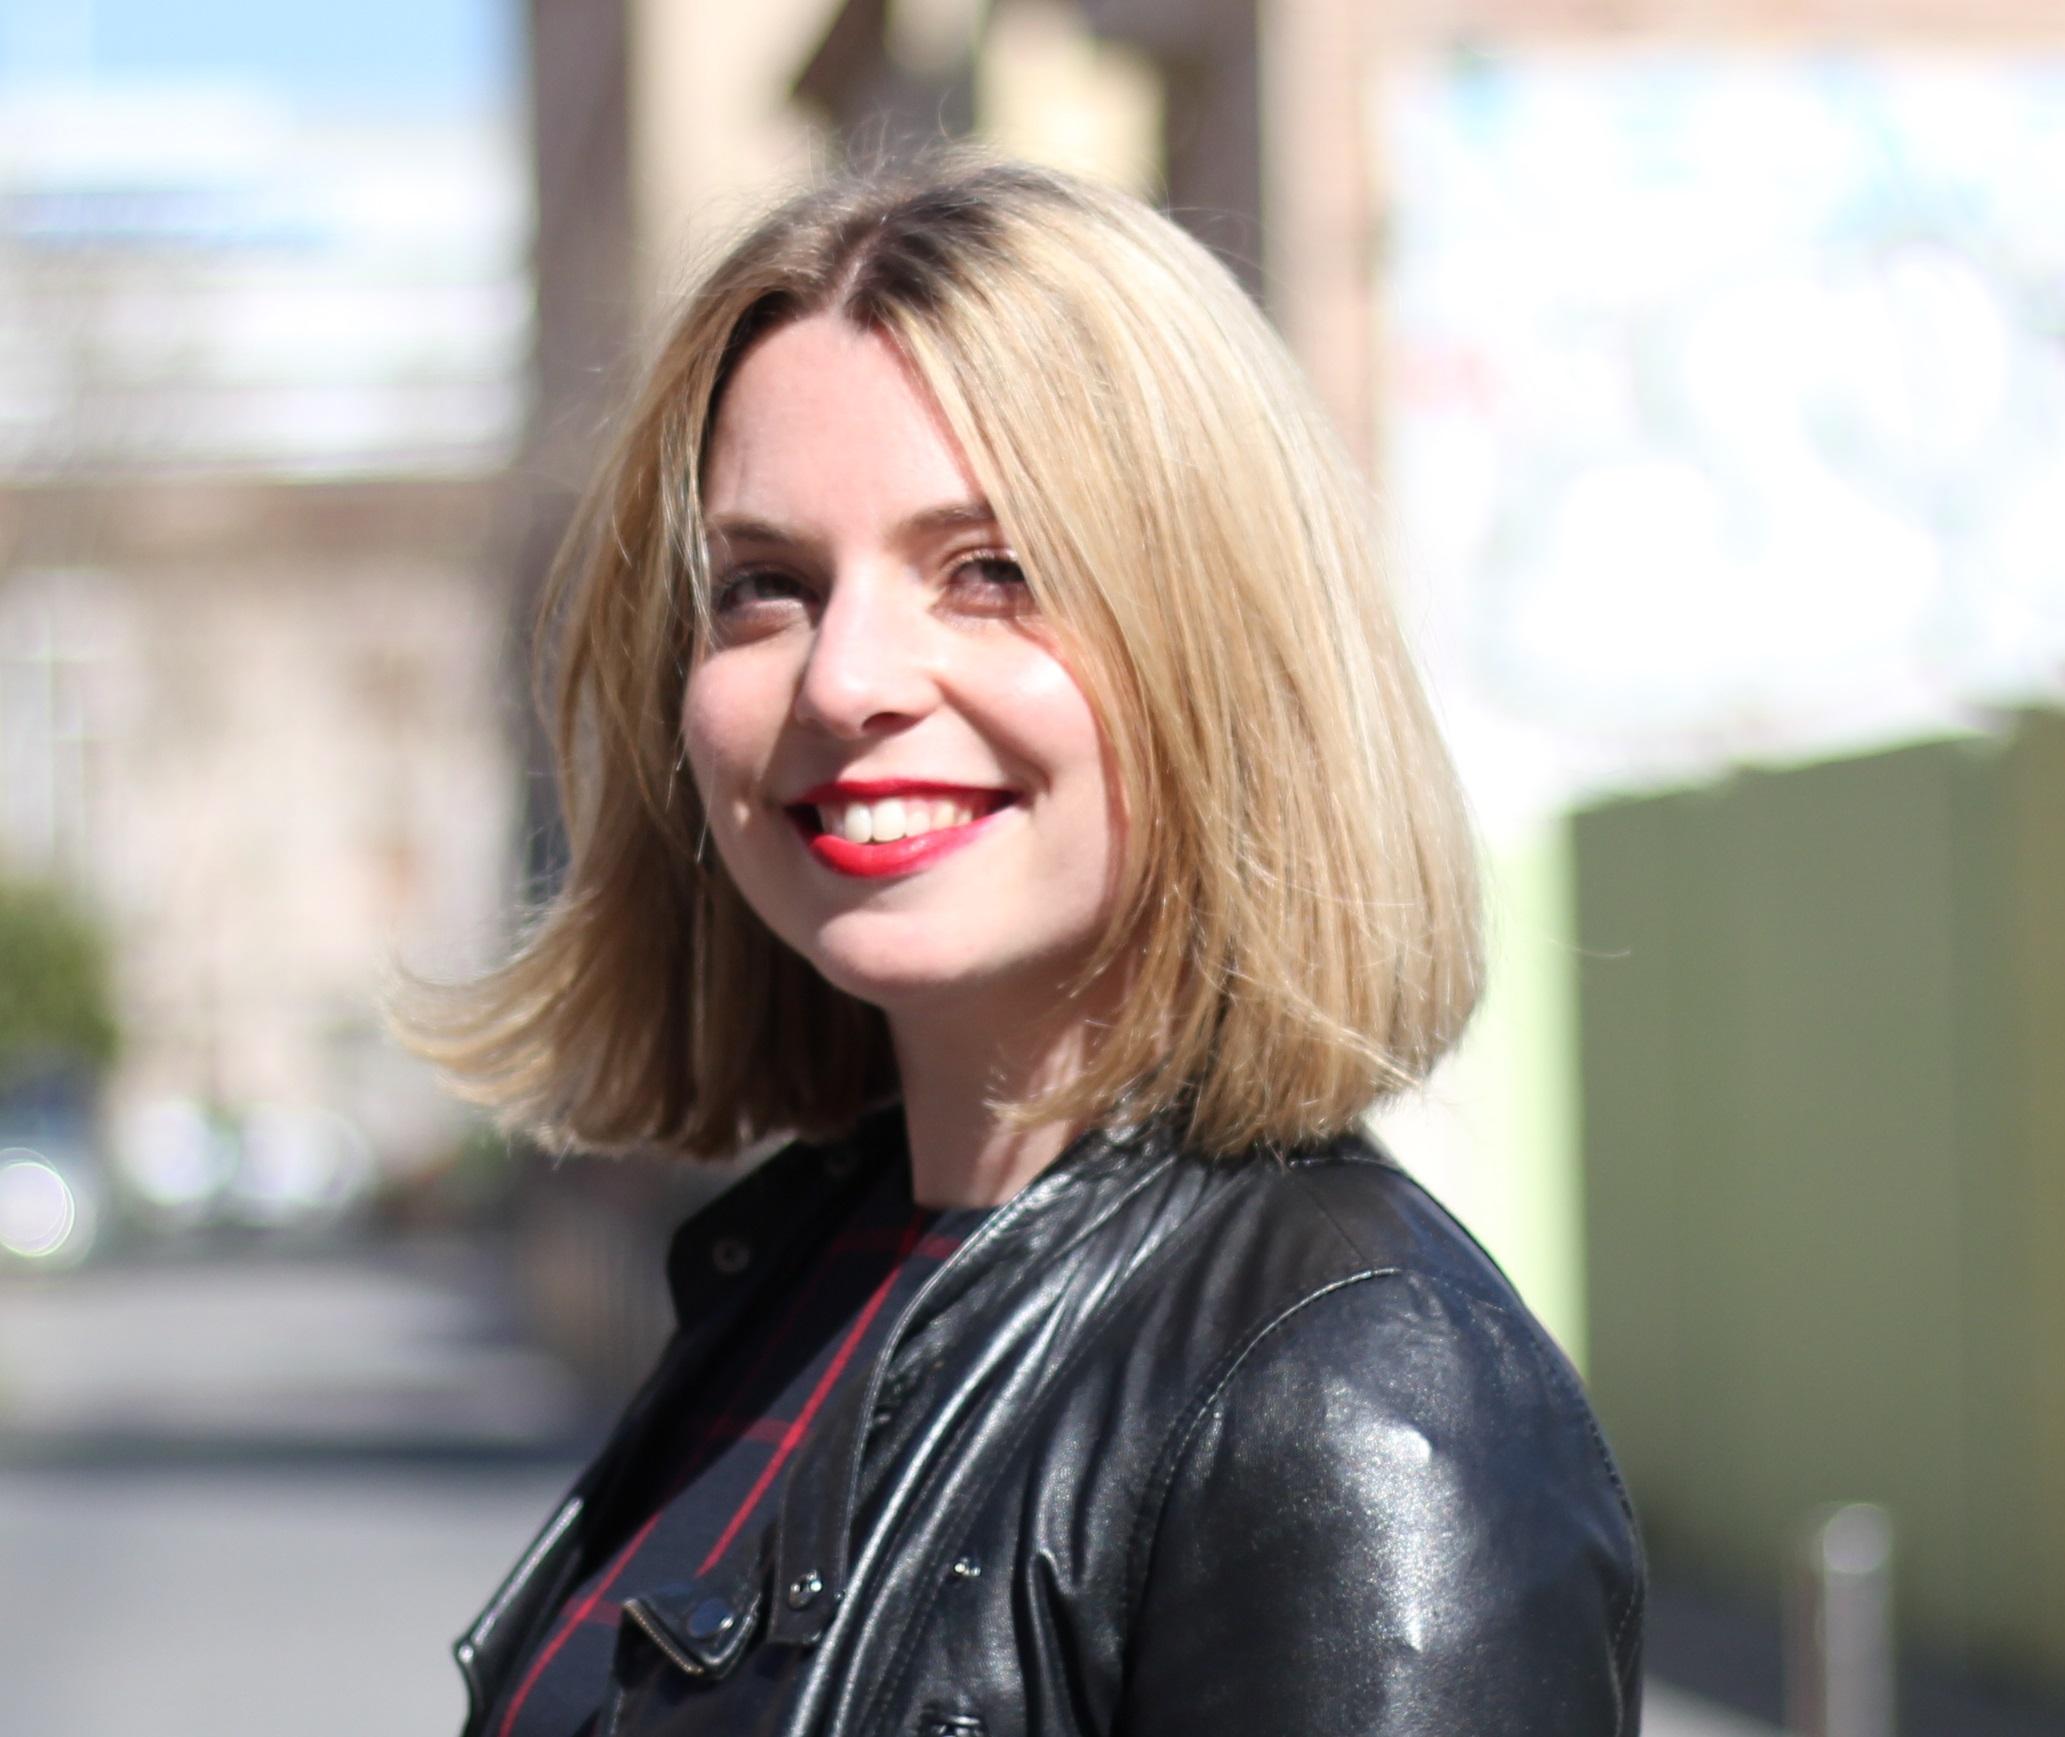 Marion Nicault